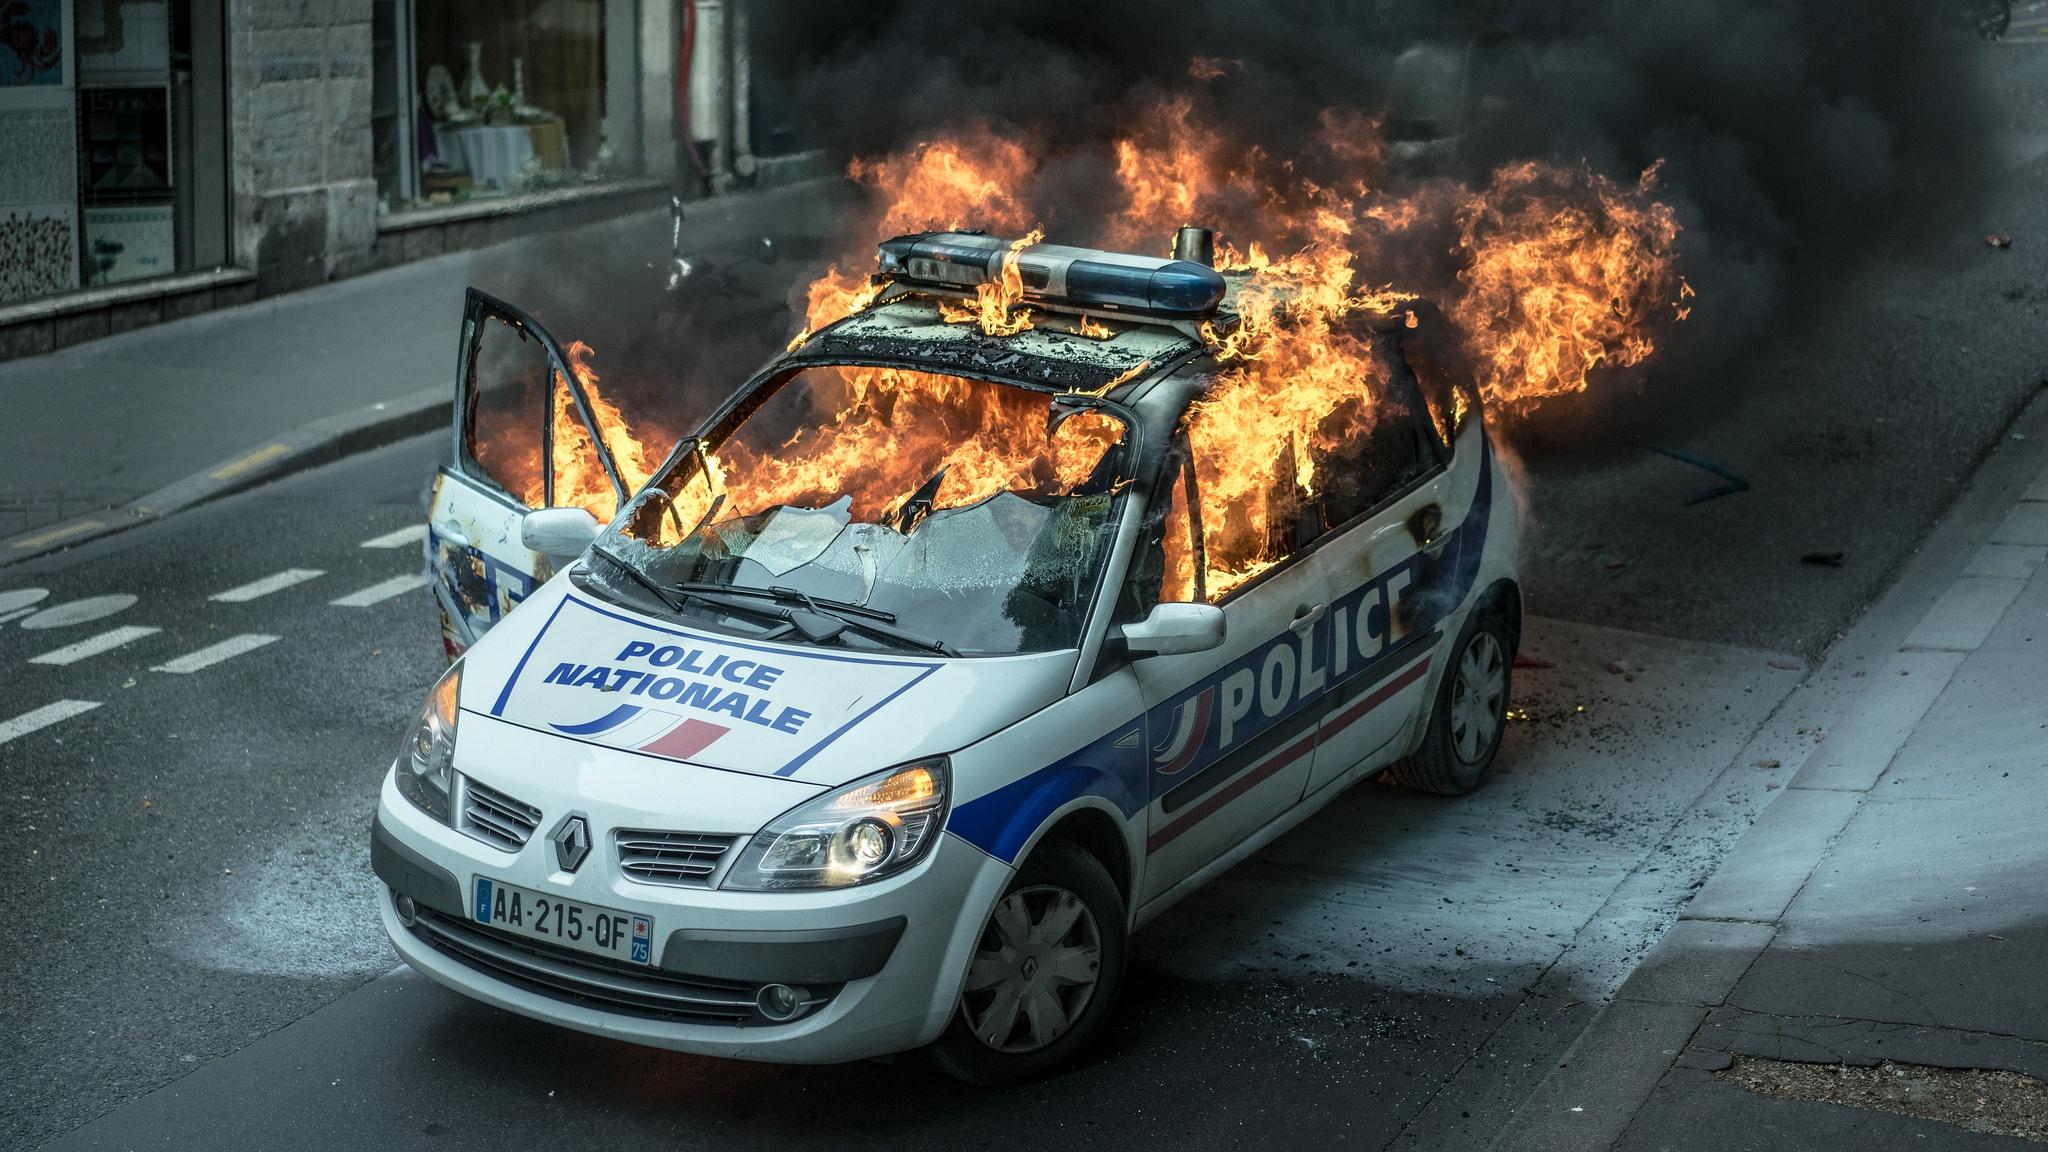 Fondos De Pantalla Policía Coche Vehículo Fuego